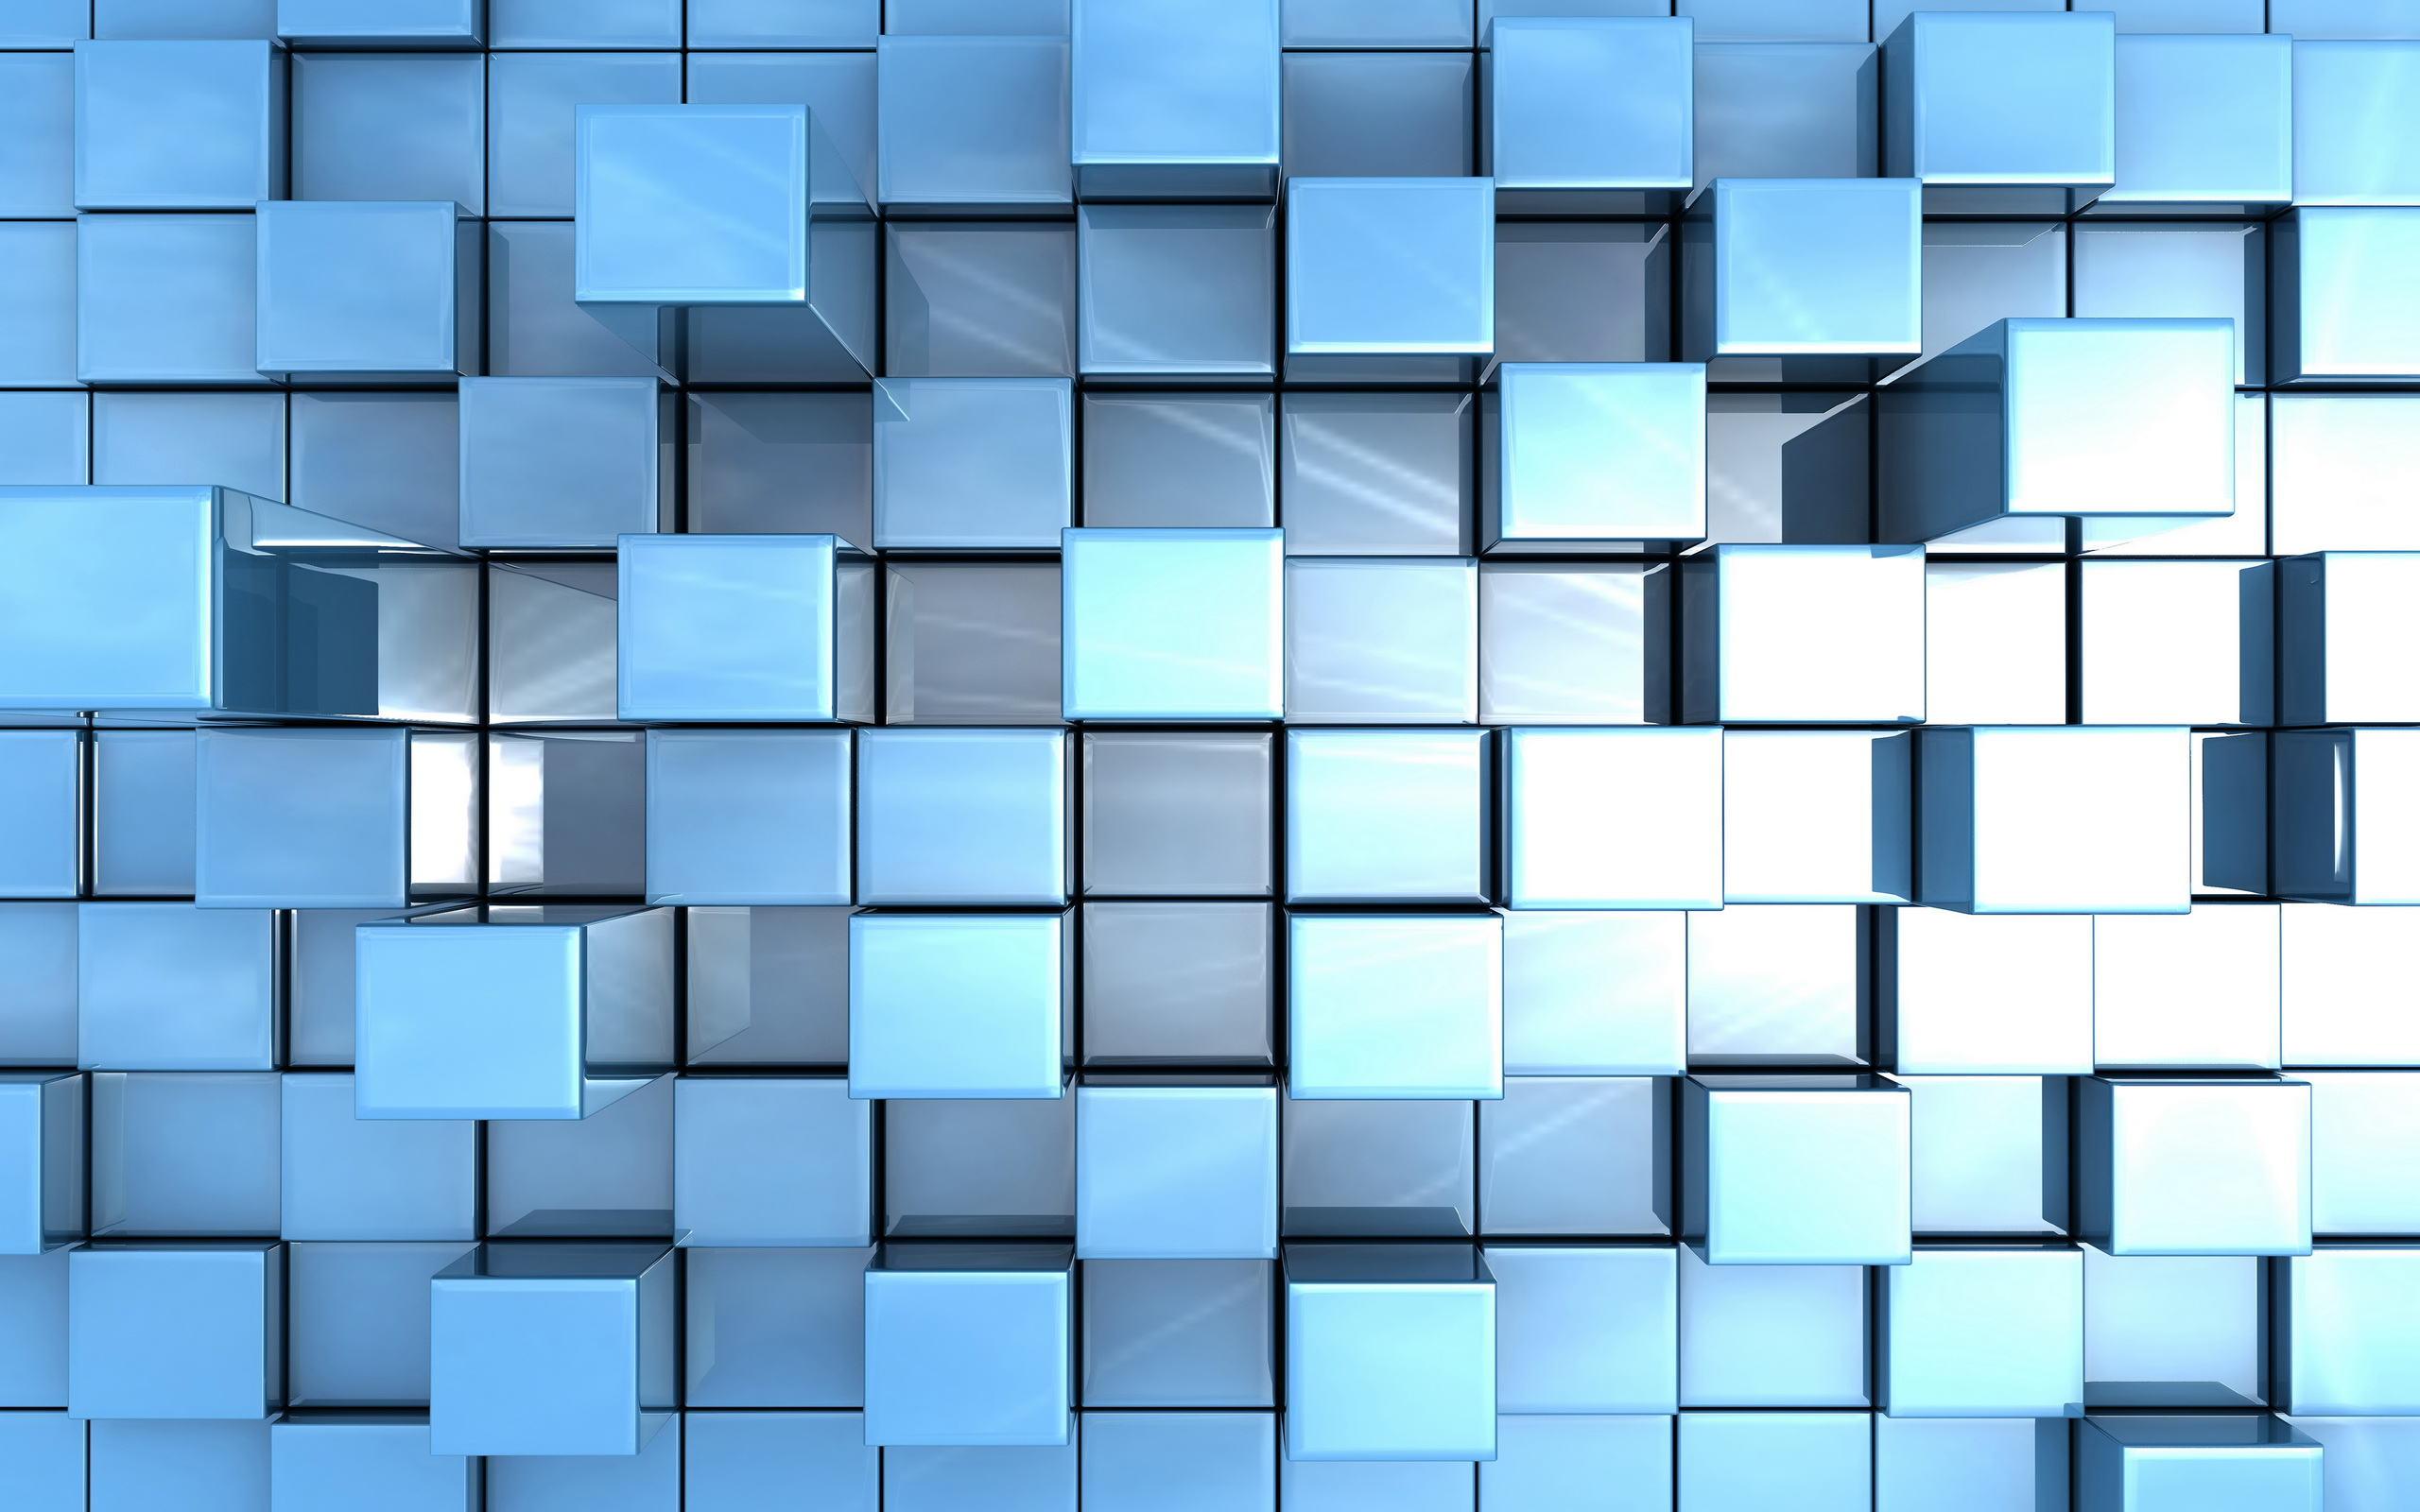 Синие кубики геометрии научной фантастики текстура фон материал ... | 1600x2560